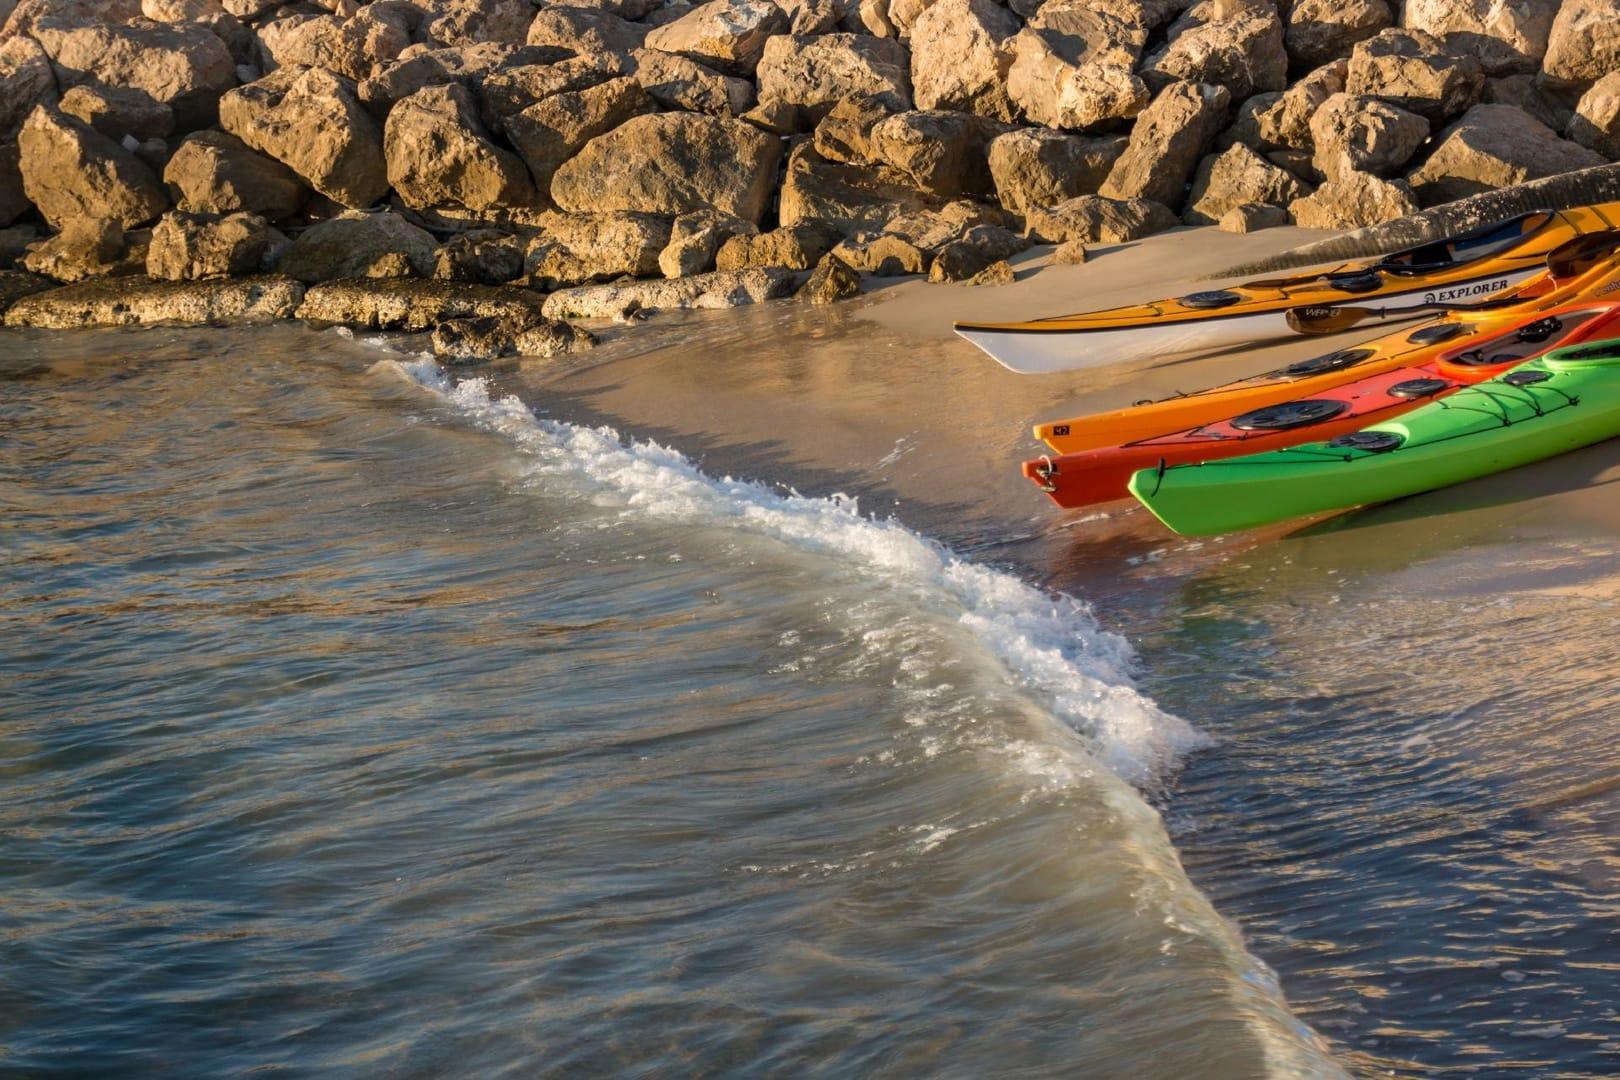 Kayak_laMata_beach_torrevieja_studierejser_alfatravel